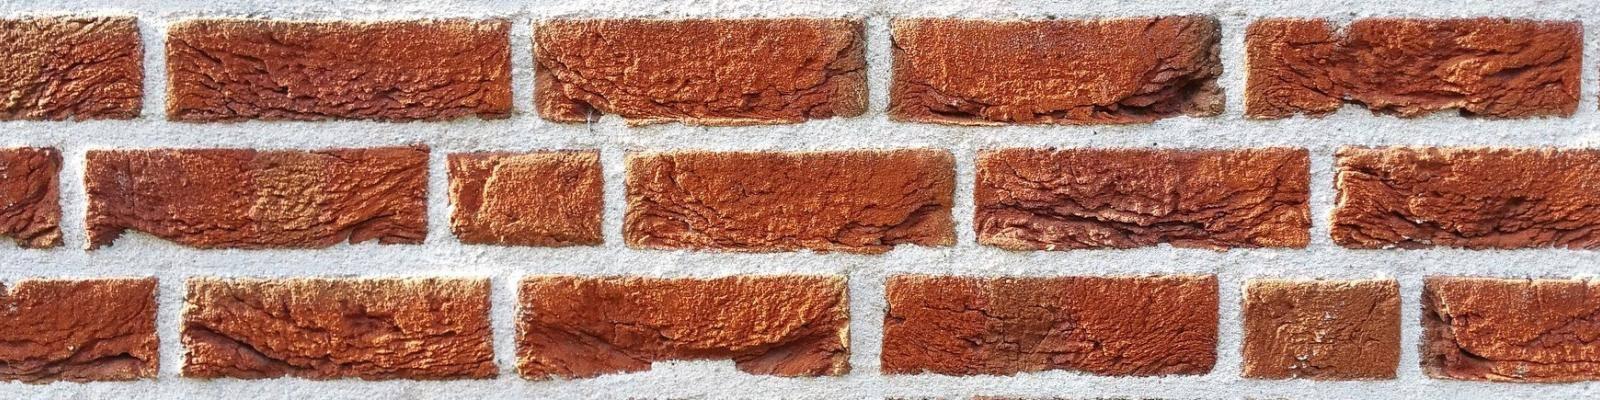 Bakstenen muur